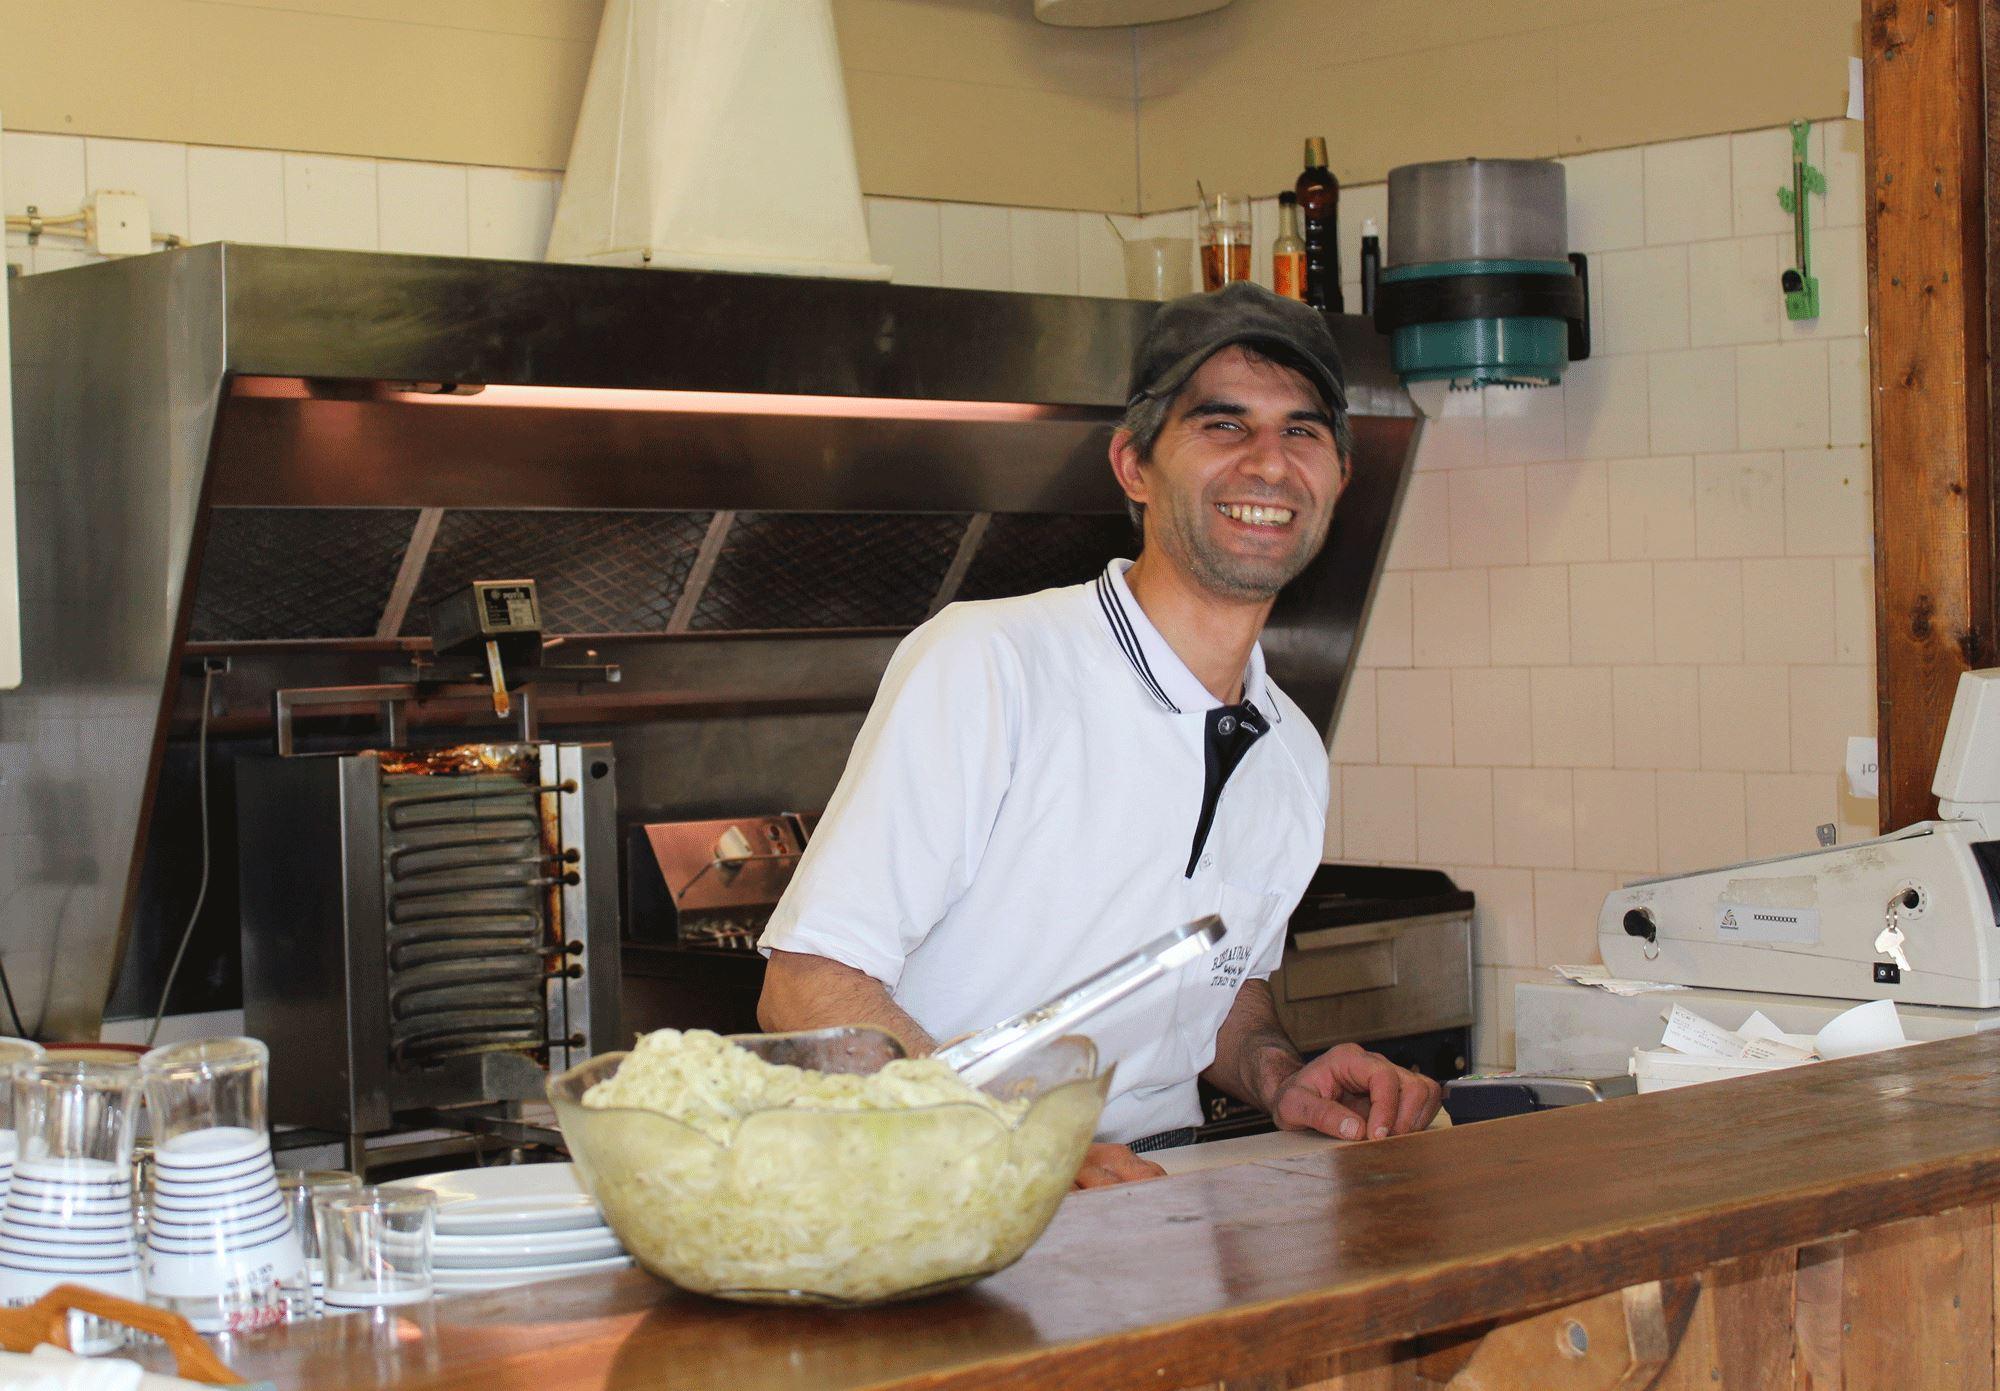 Pizzeria Turin